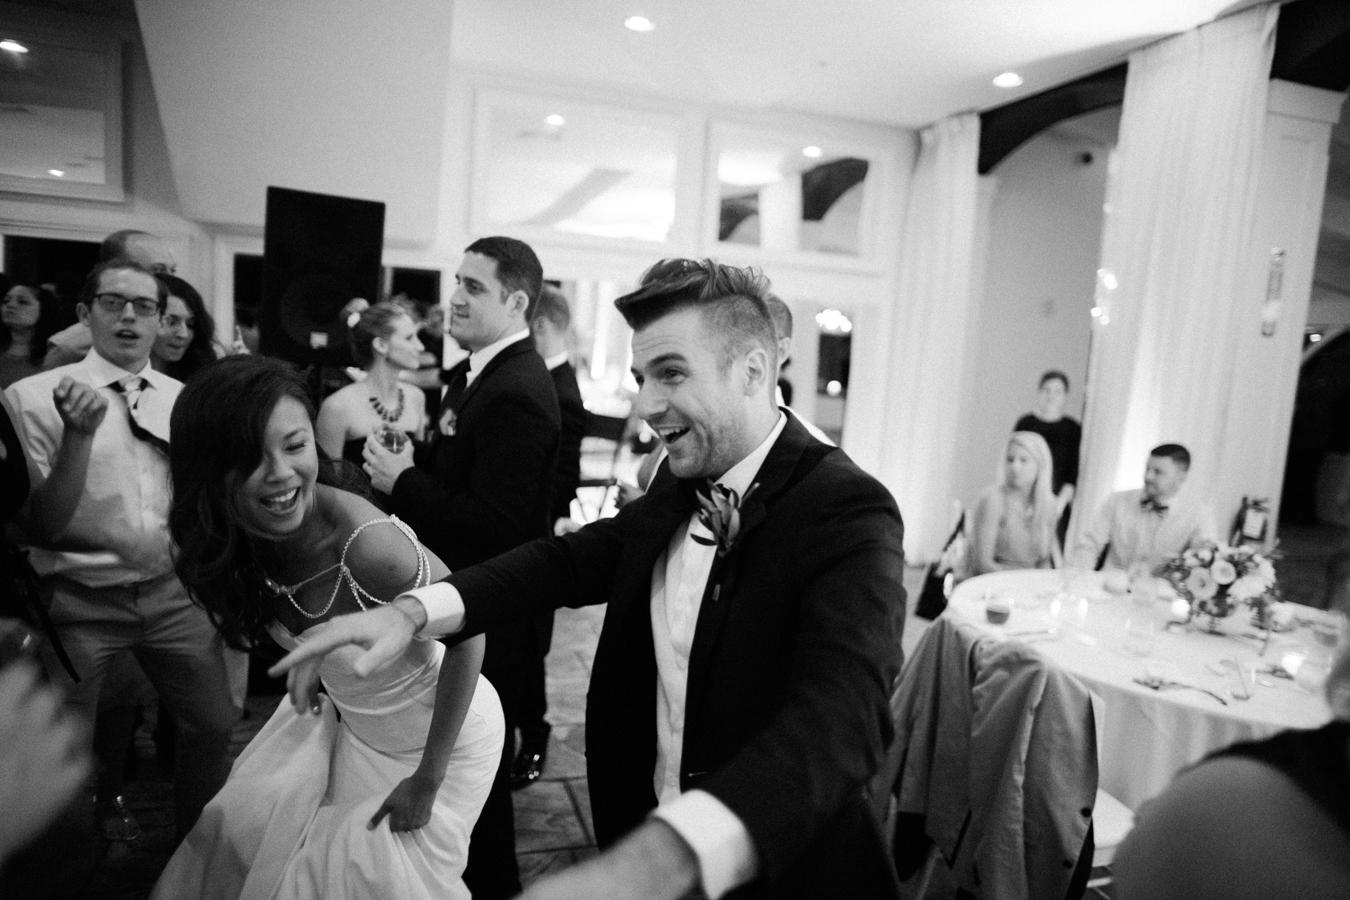 826_Jake+Kathryn_Brumley & Wells_Fine_Art_Film_Photography_Newport_Wedding.jpg